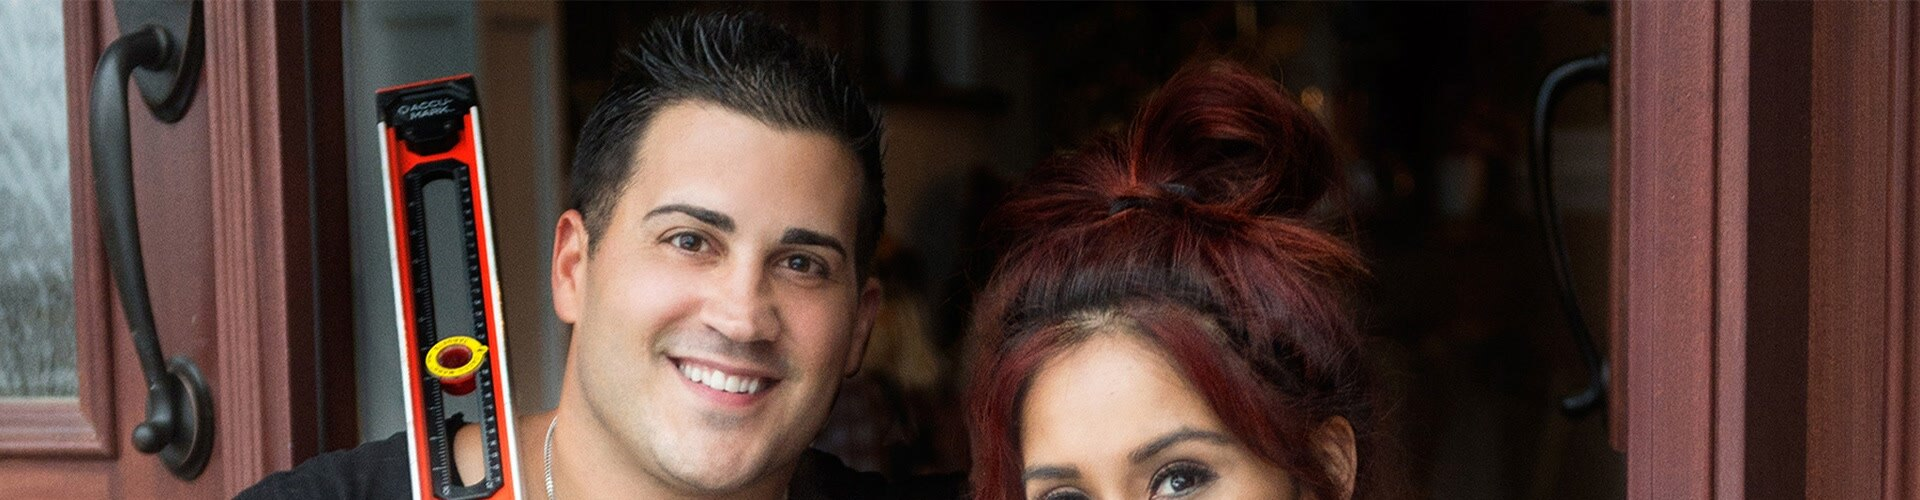 Watch Nicole & Jionni's Shore Flip Online